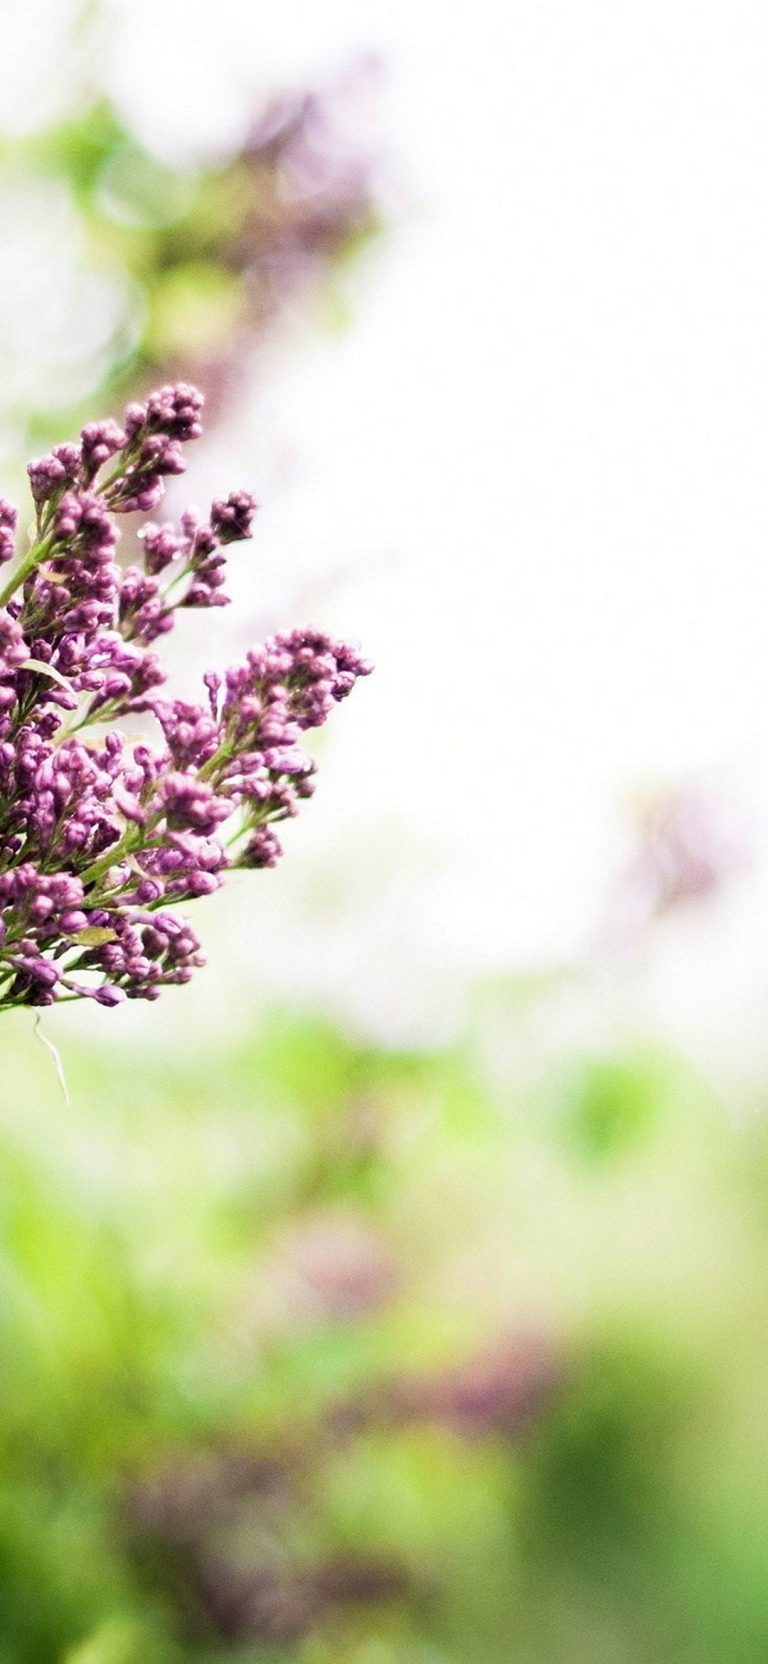 Lilac Branch Spring 1080x2340 768x1664